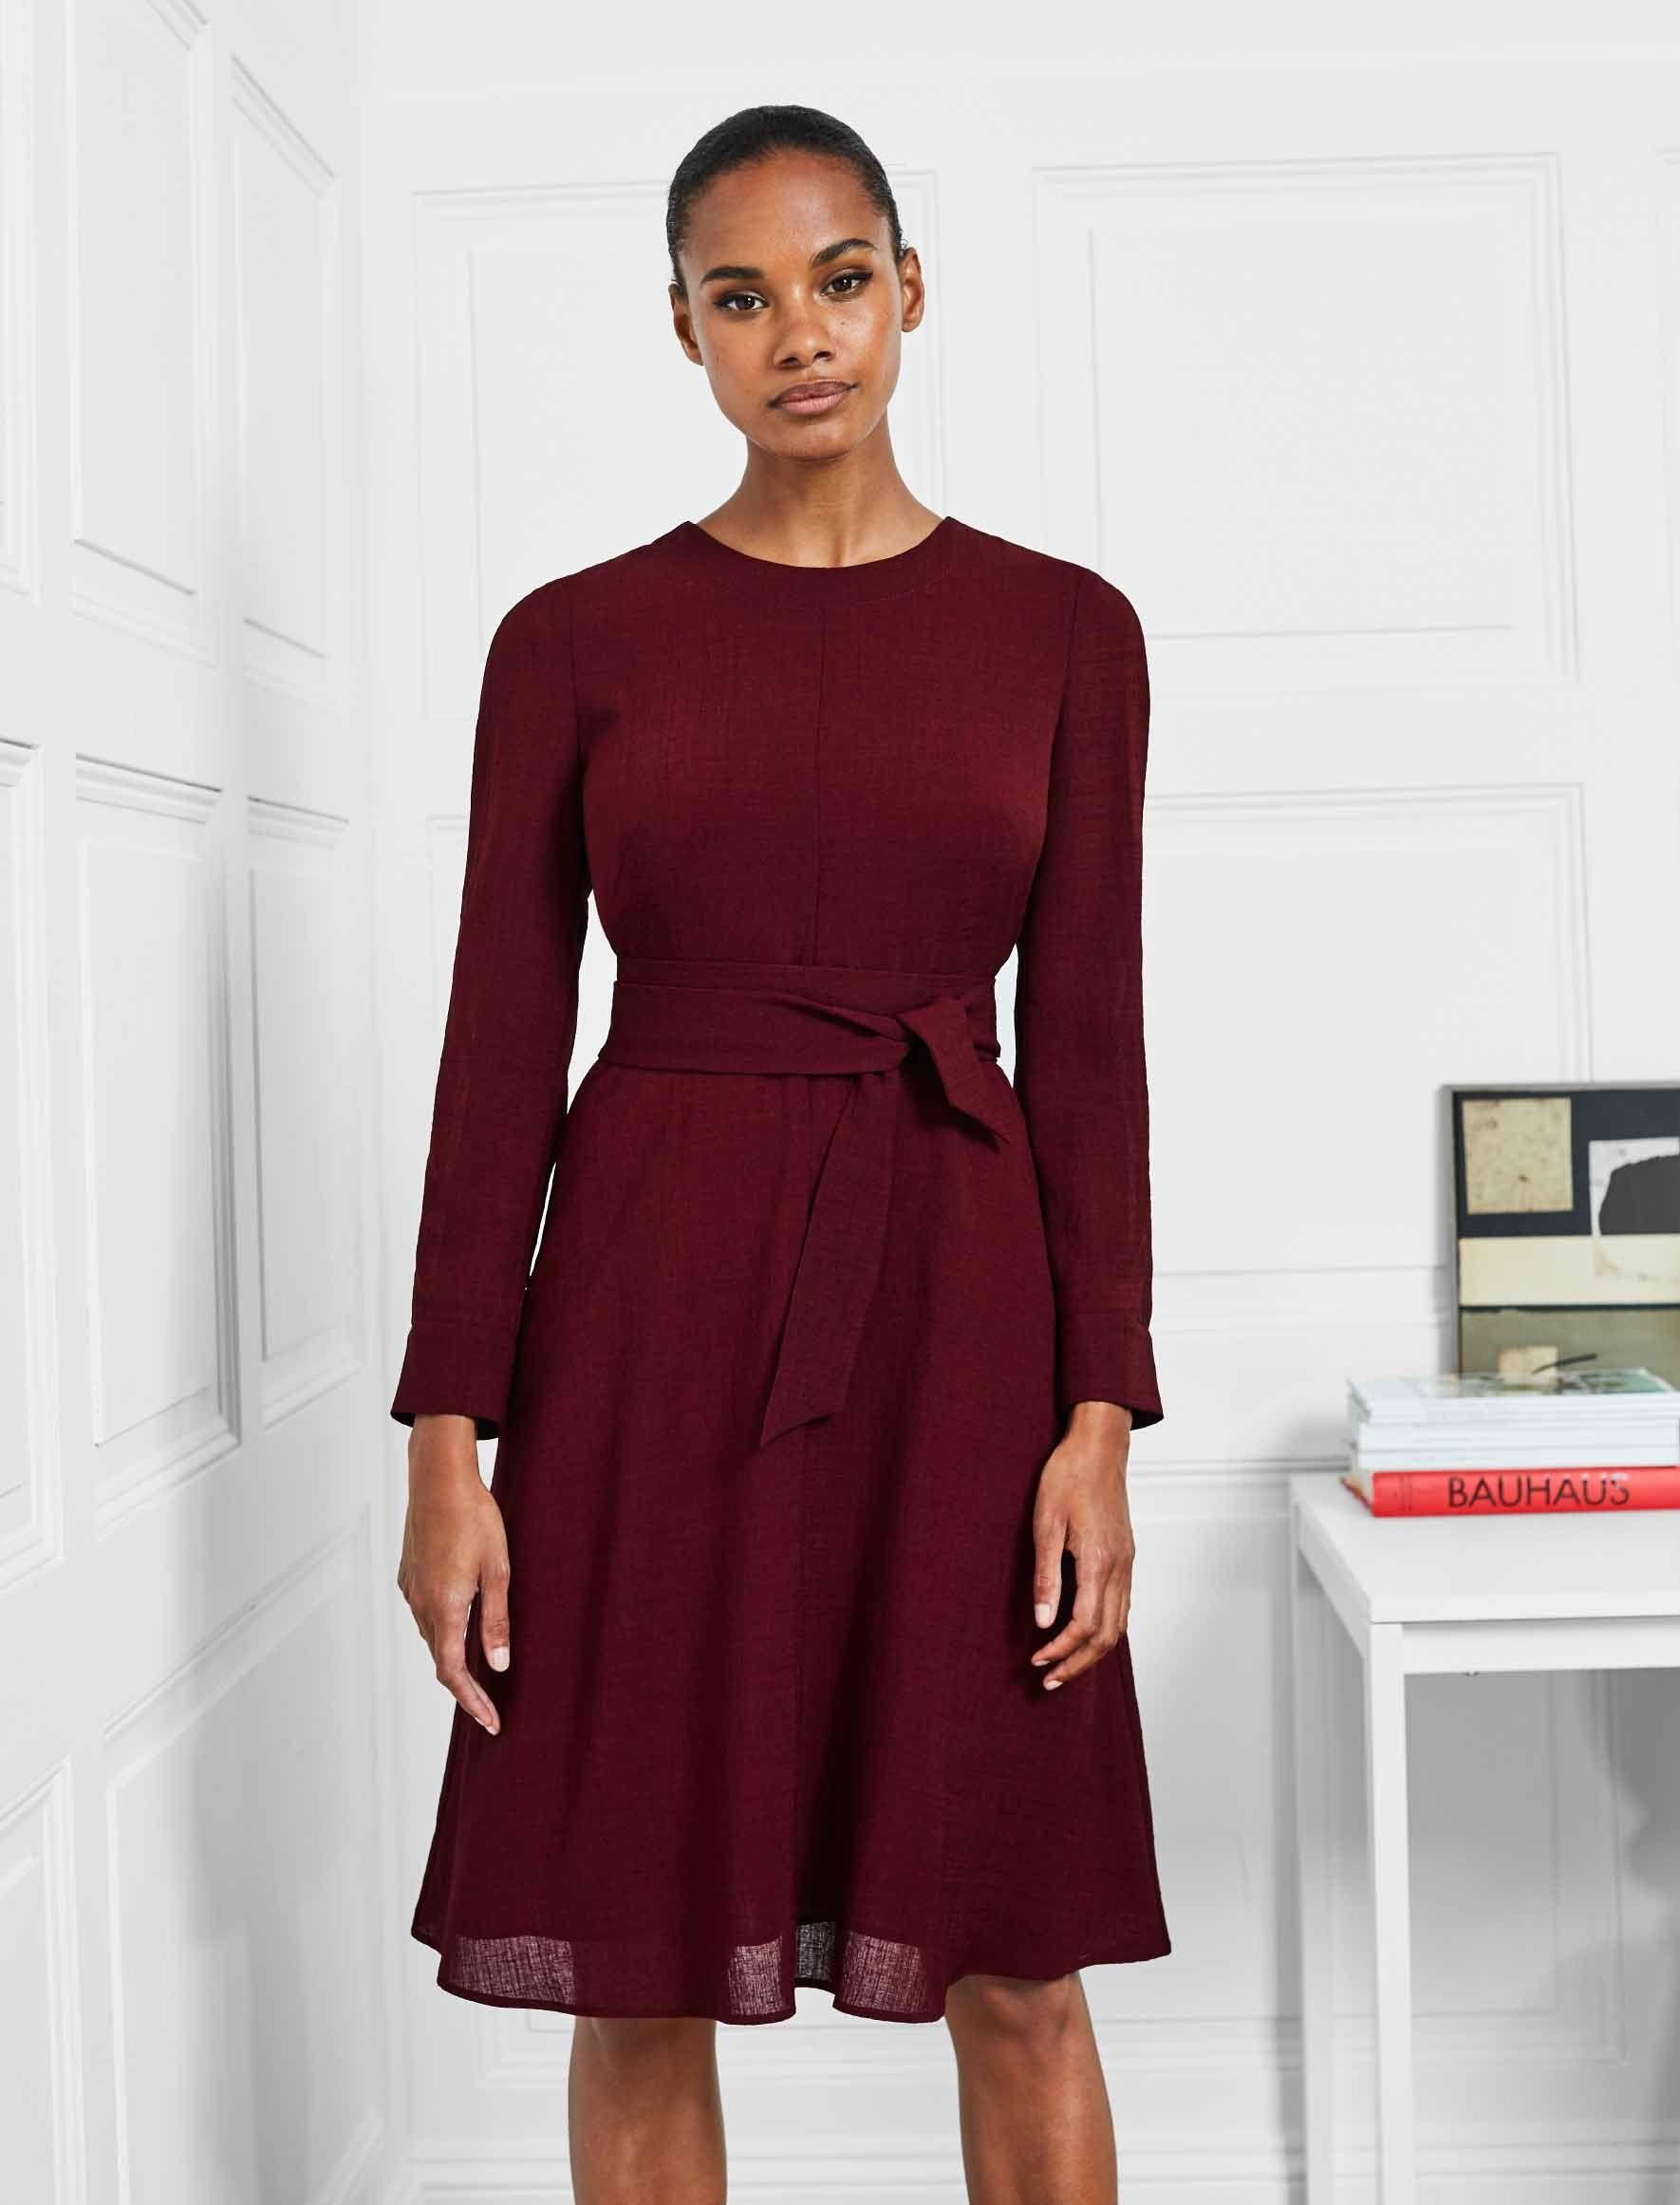 Long Sleeve Knee Length Dress With Wide Belt Dark Red Dark Red Long Sleeve Knee Dress Knee Length Dress Long Red Dress Dark Red Dresses [ 2323 x 1770 Pixel ]